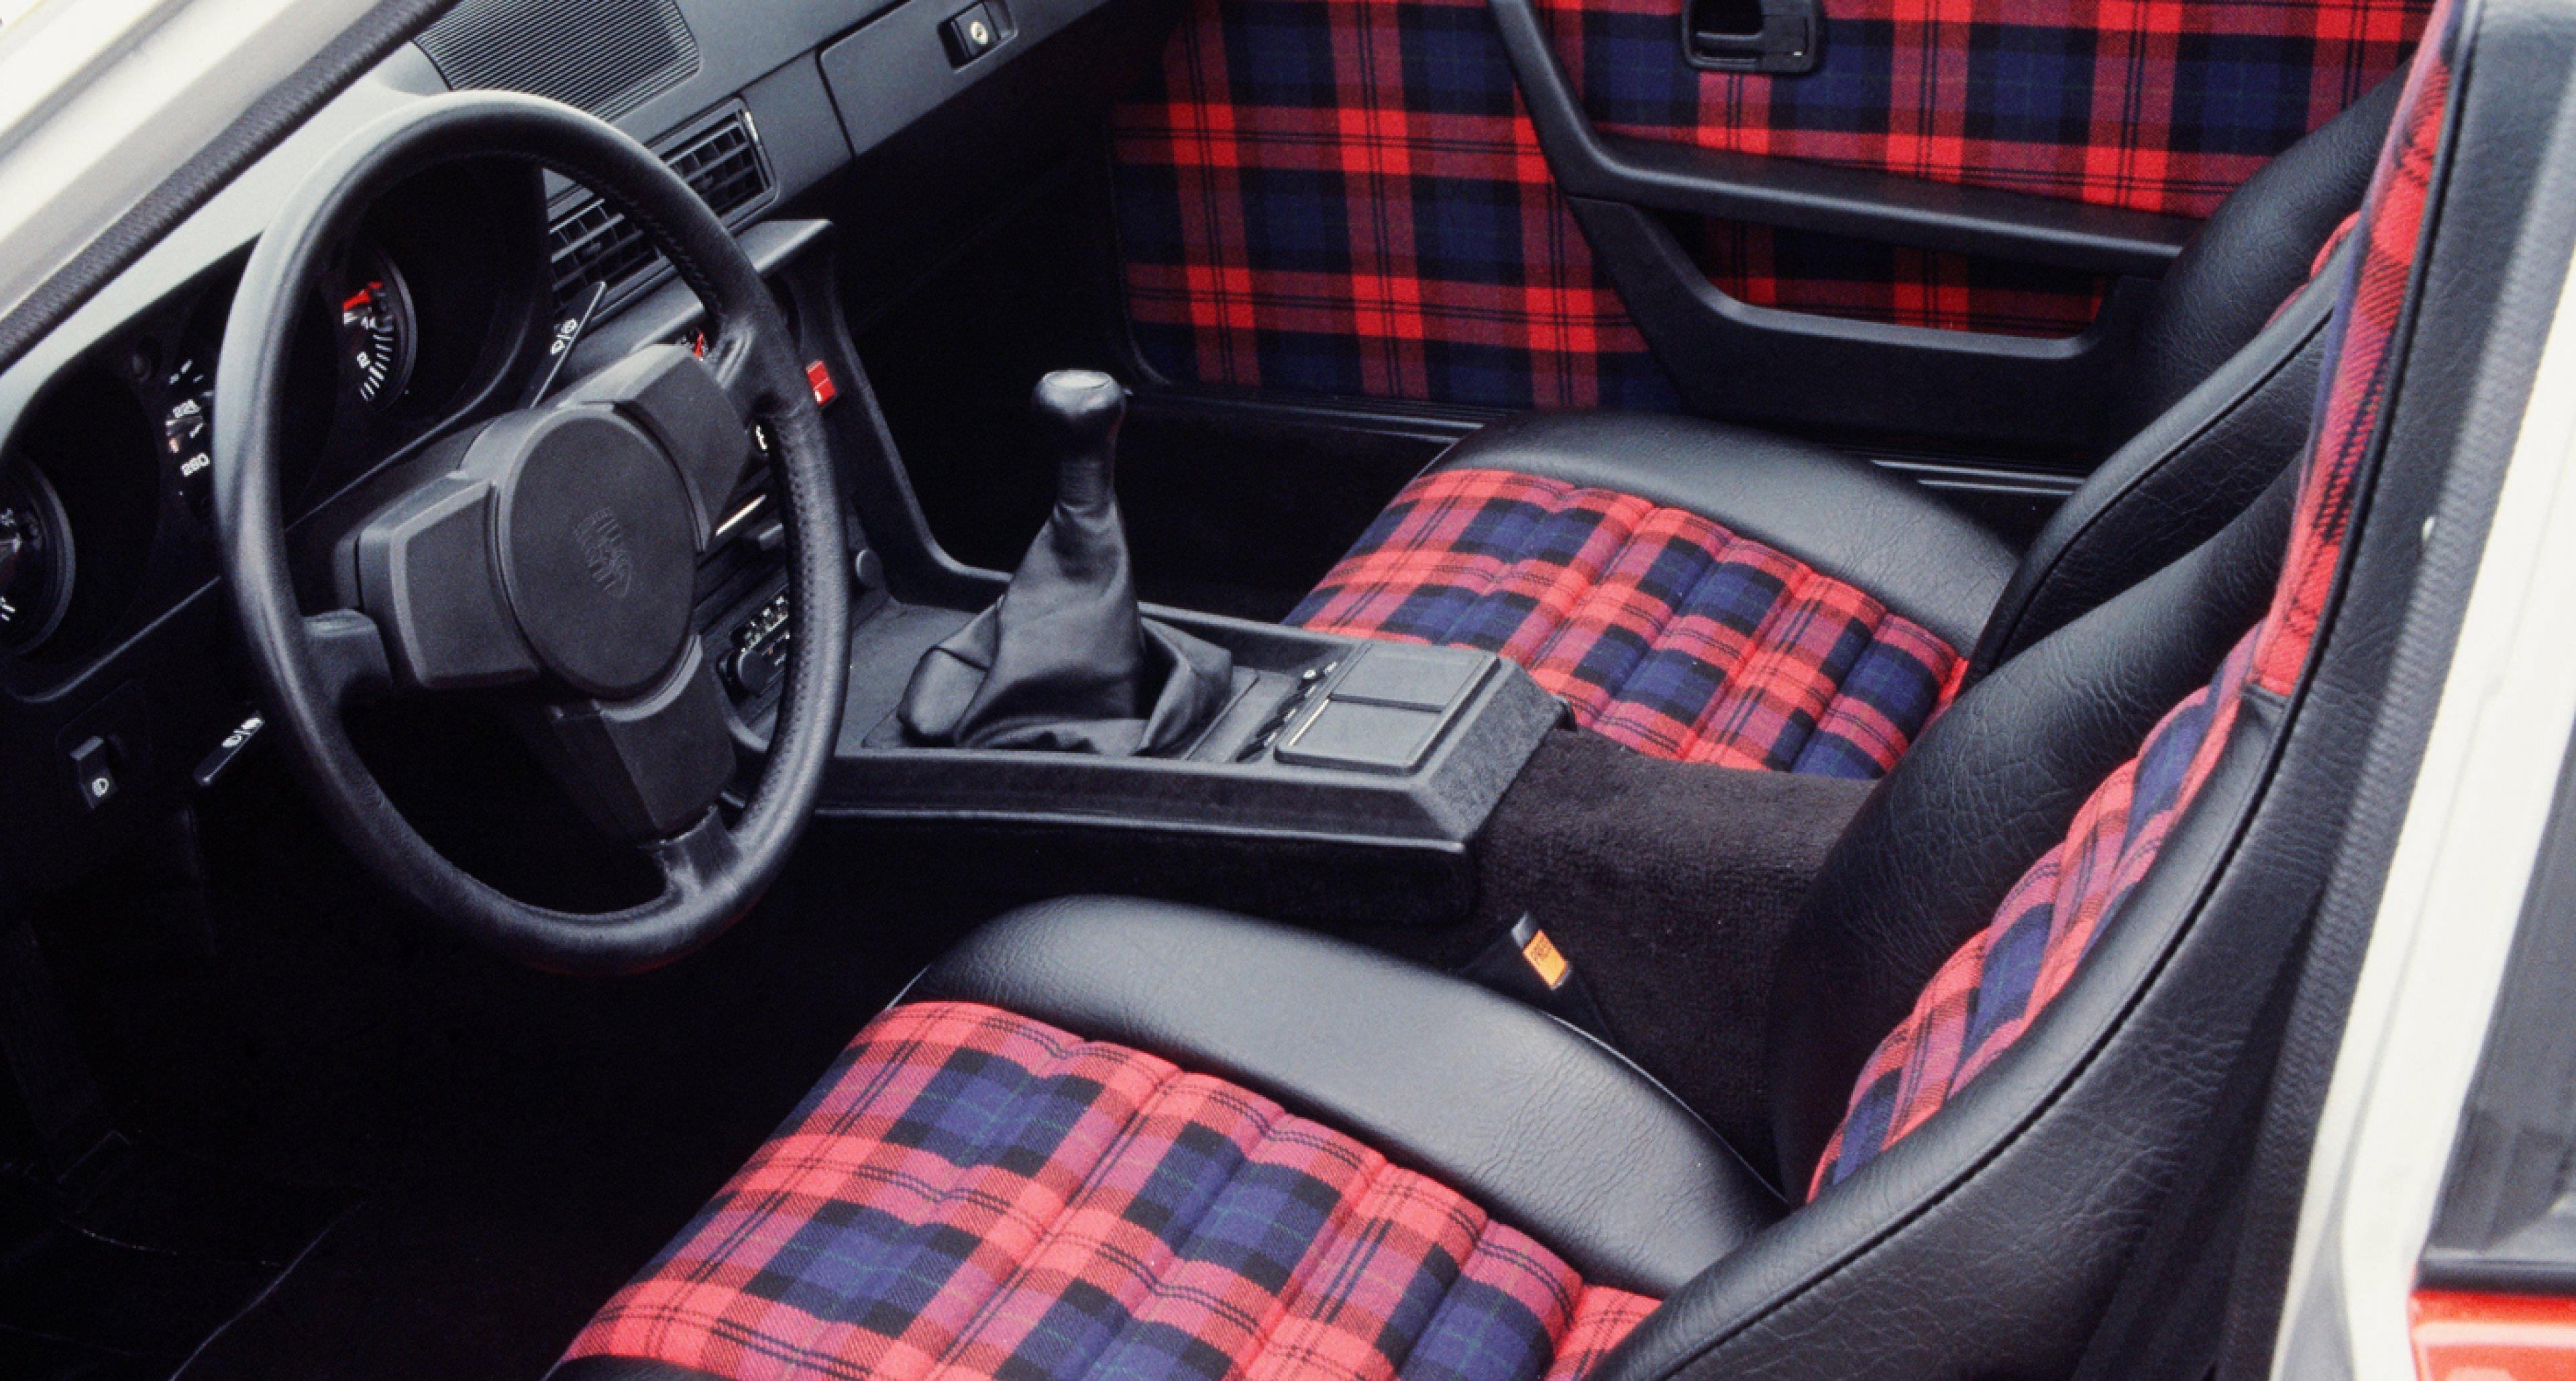 Tartan seats in a 1979 Porsche 924 Turbo.